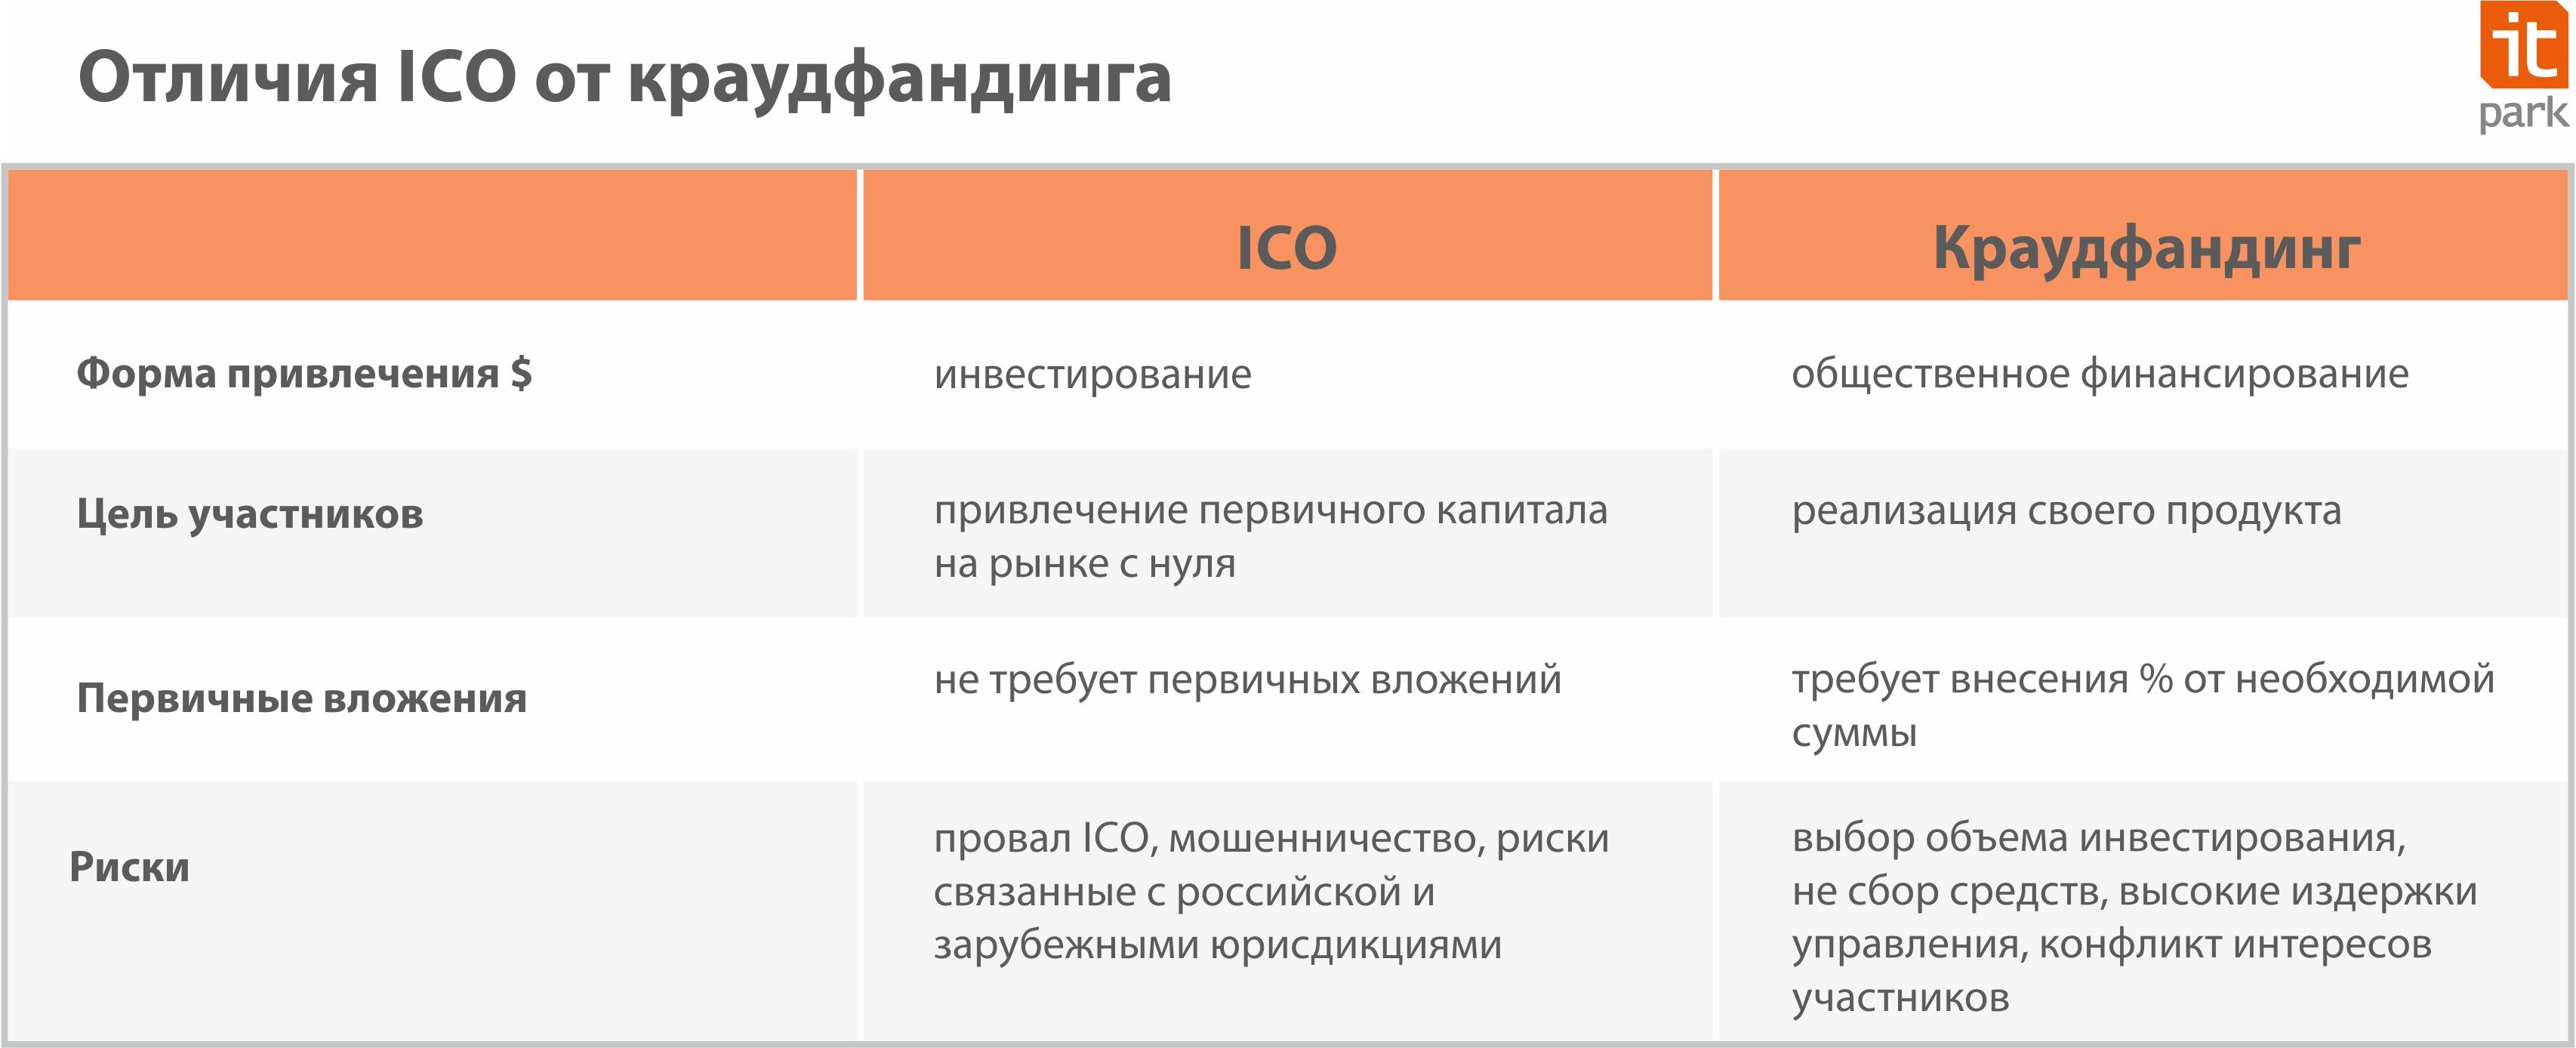 Отличия ICO и краудфандинга